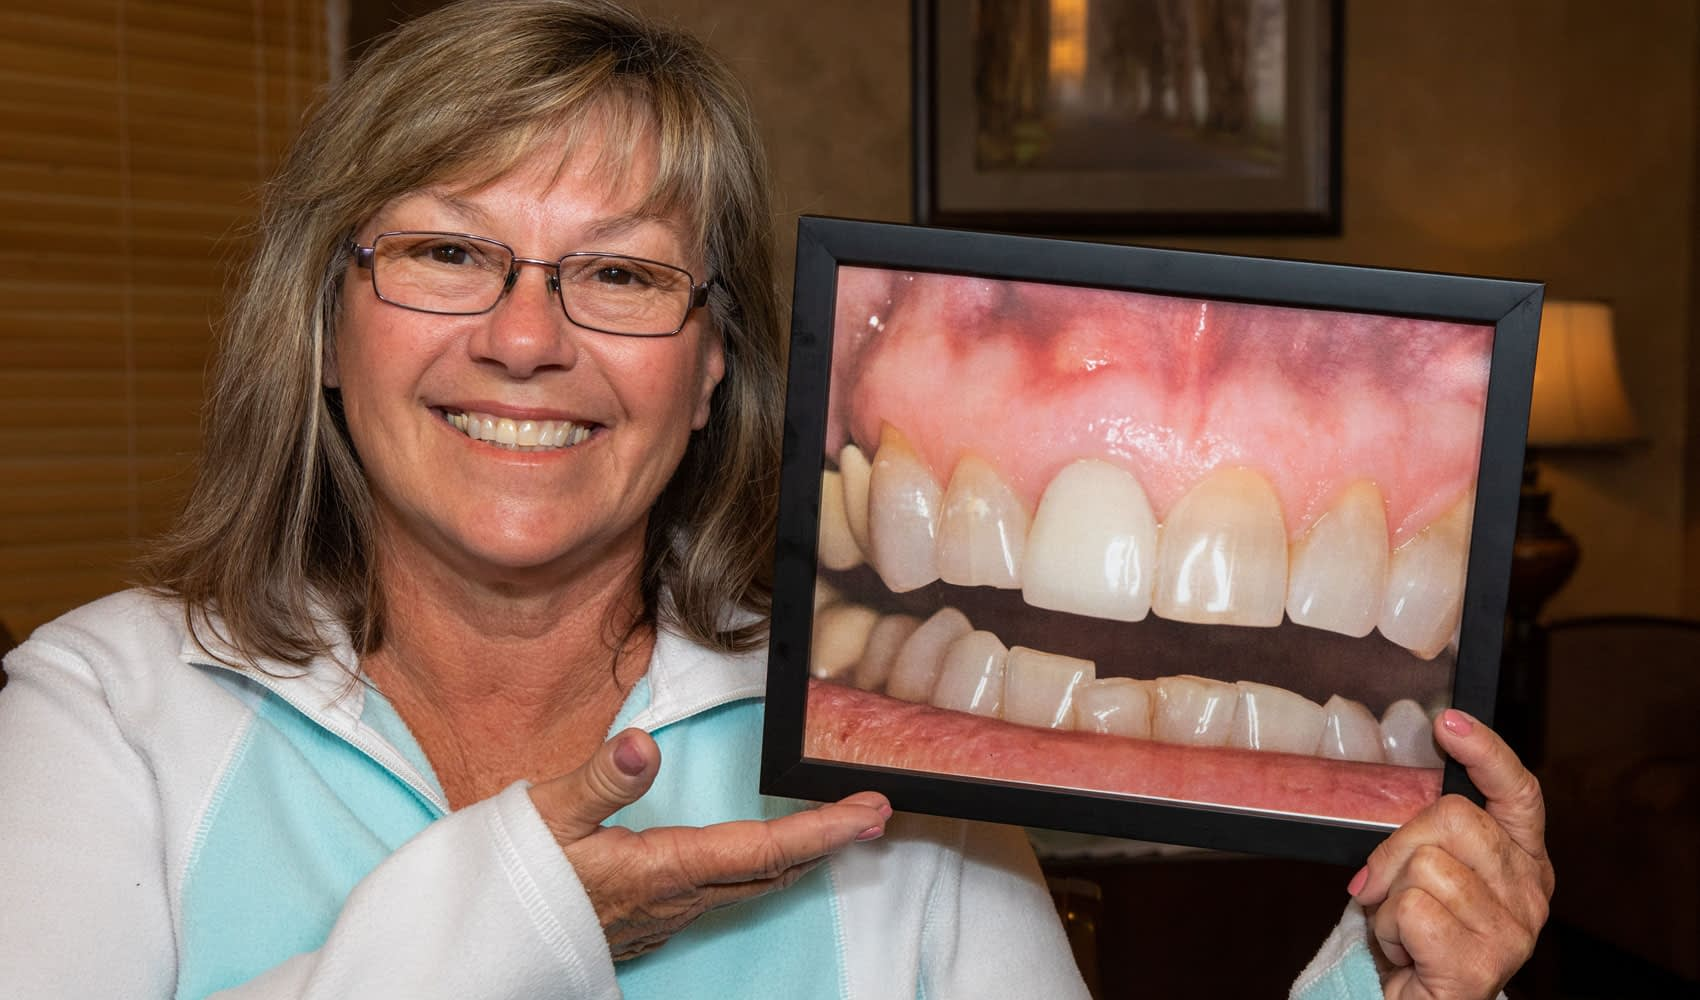 dental implants patient smiling Tavares, FL